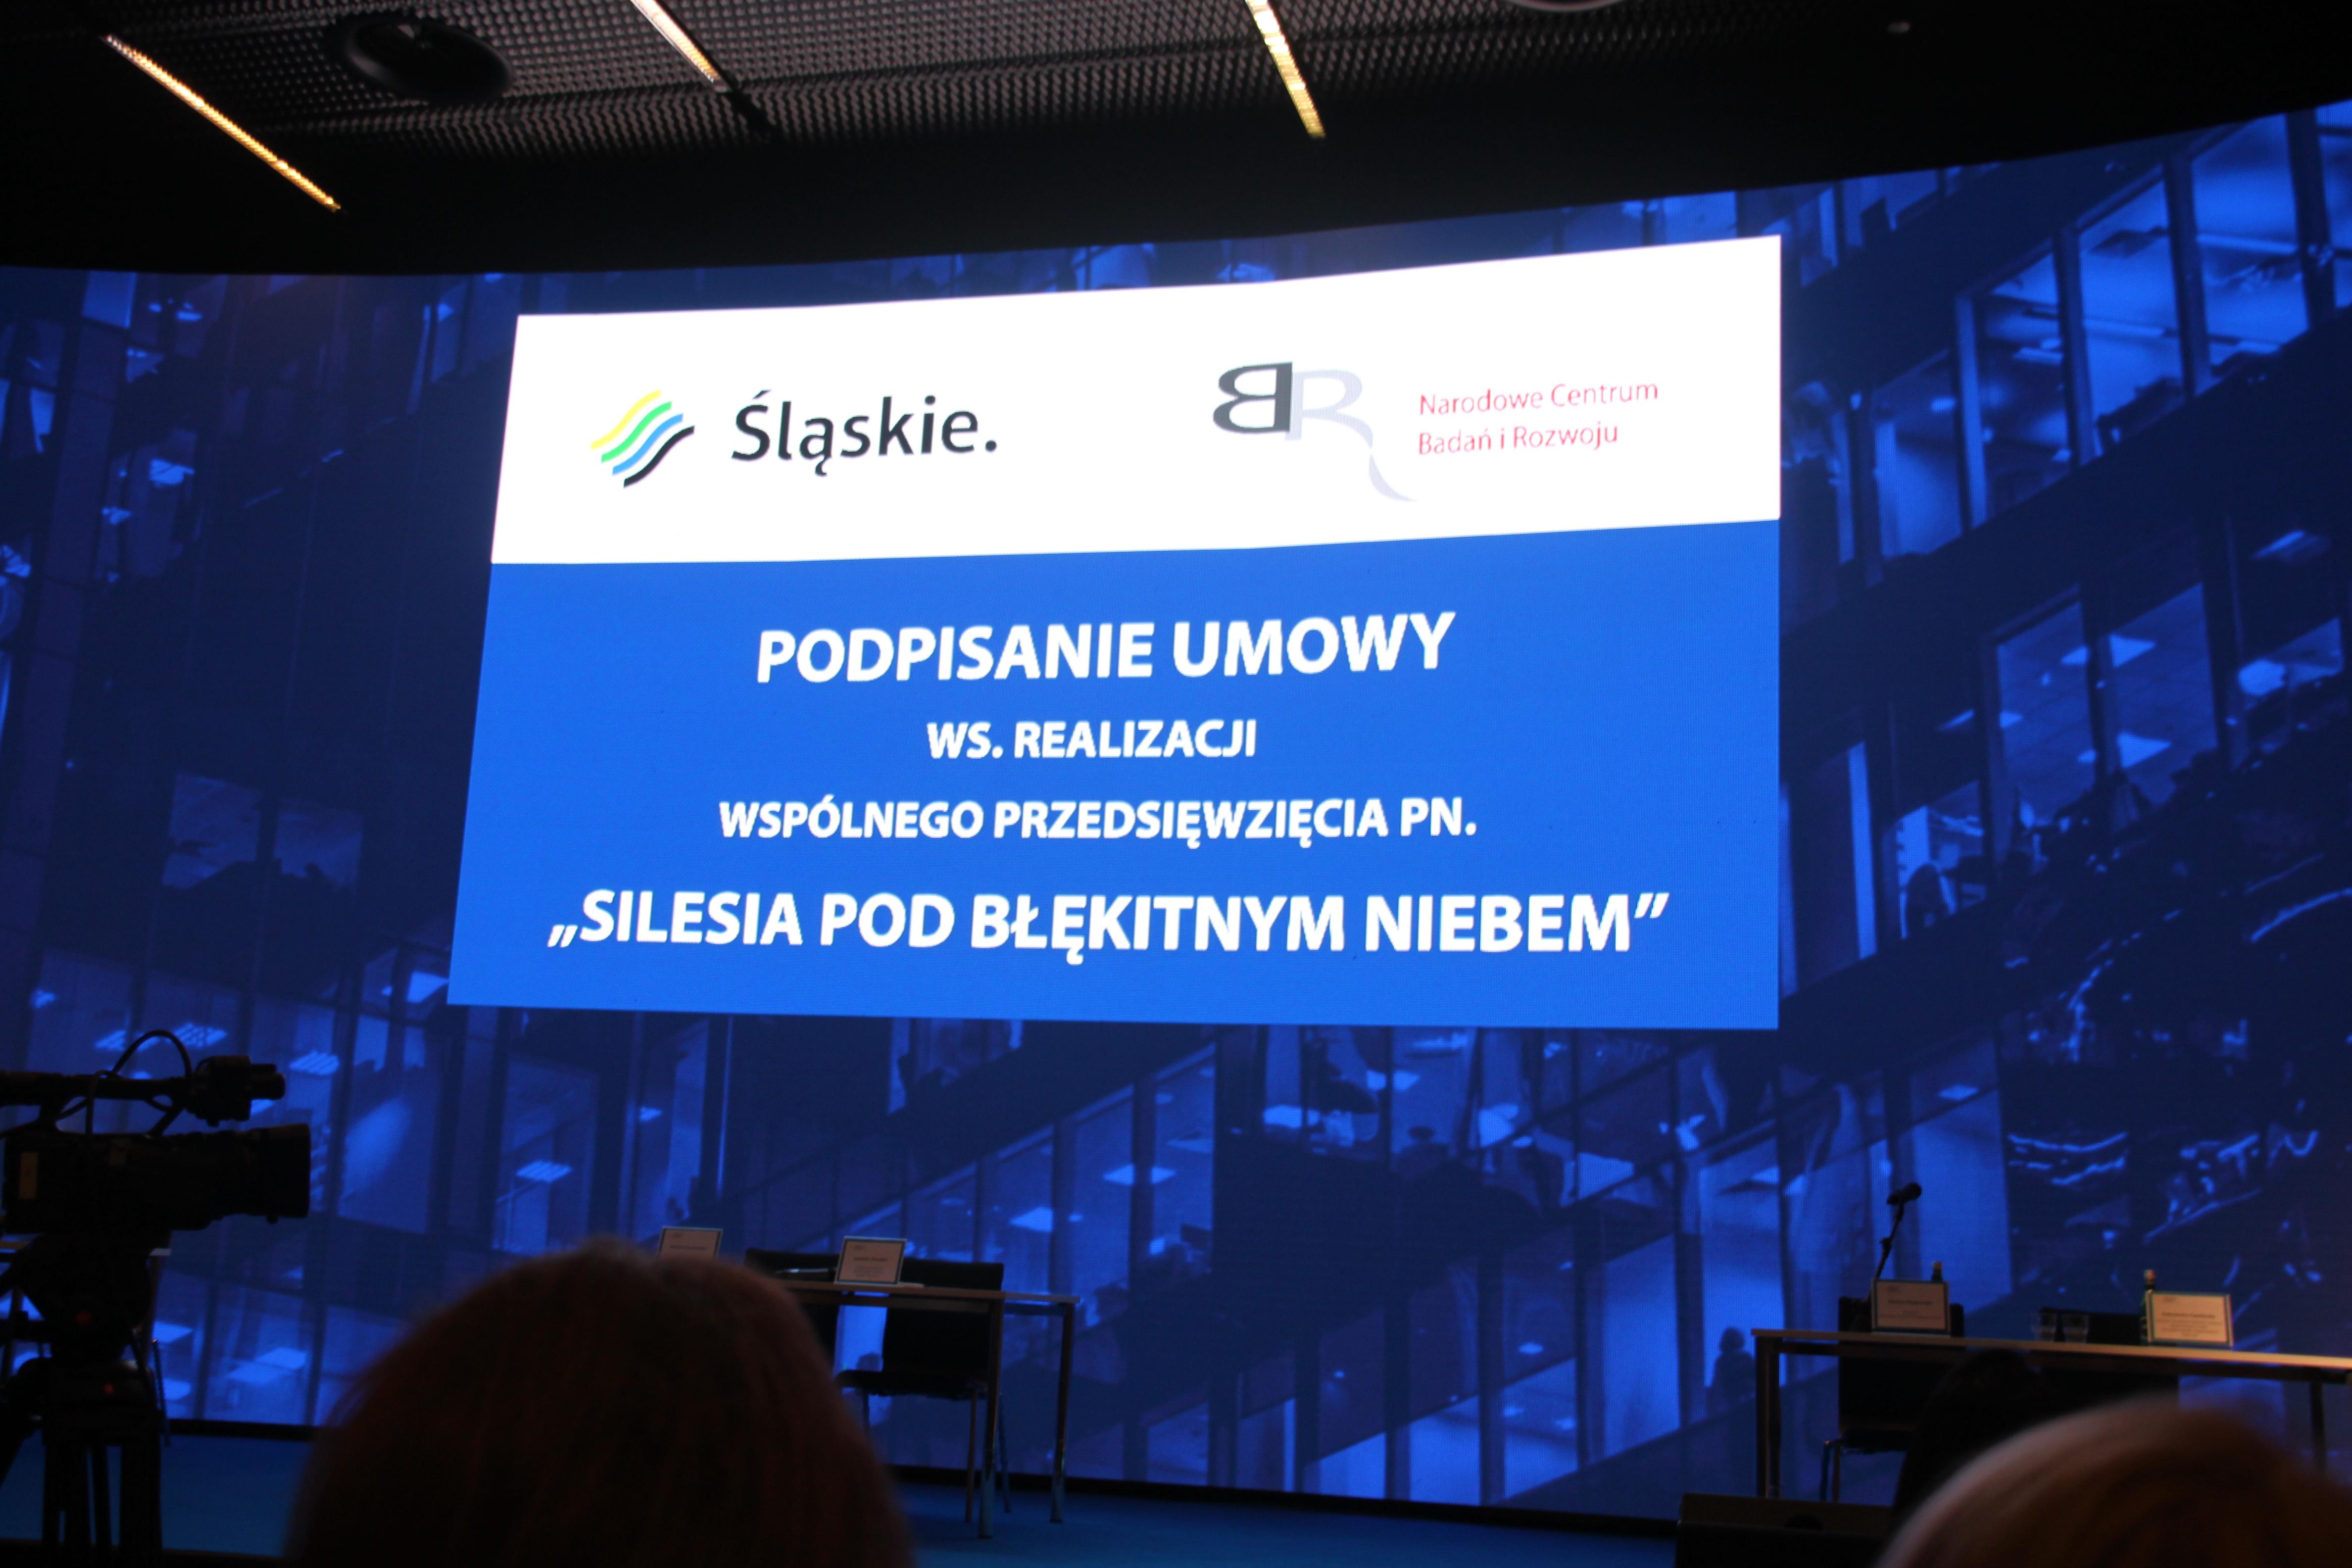 Silesia pod błękitnym niebem